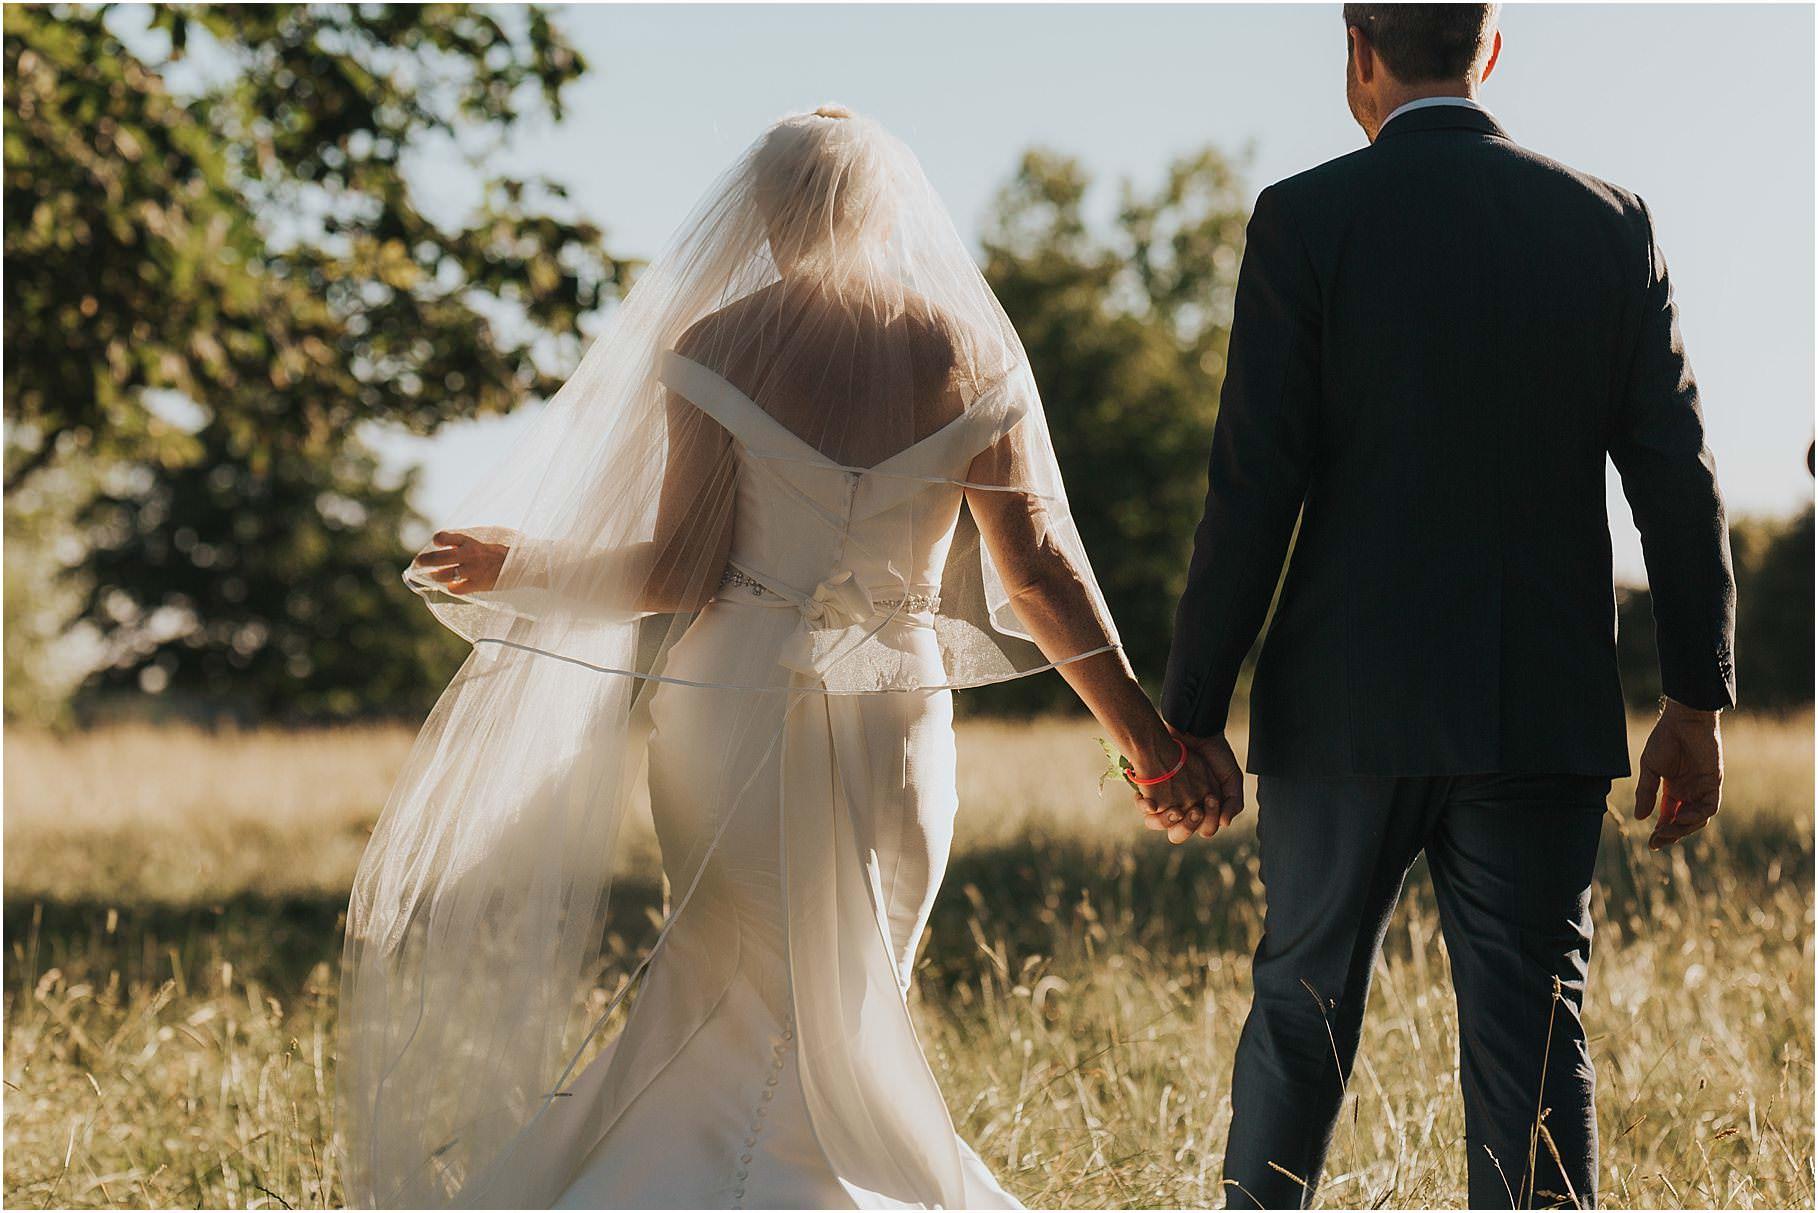 Cambridgeshire Wedding Photographer Black Horse Elton Wedding 1087 - Mr and Mrs Mac // CAMBRIDGESHIRE WEDDING